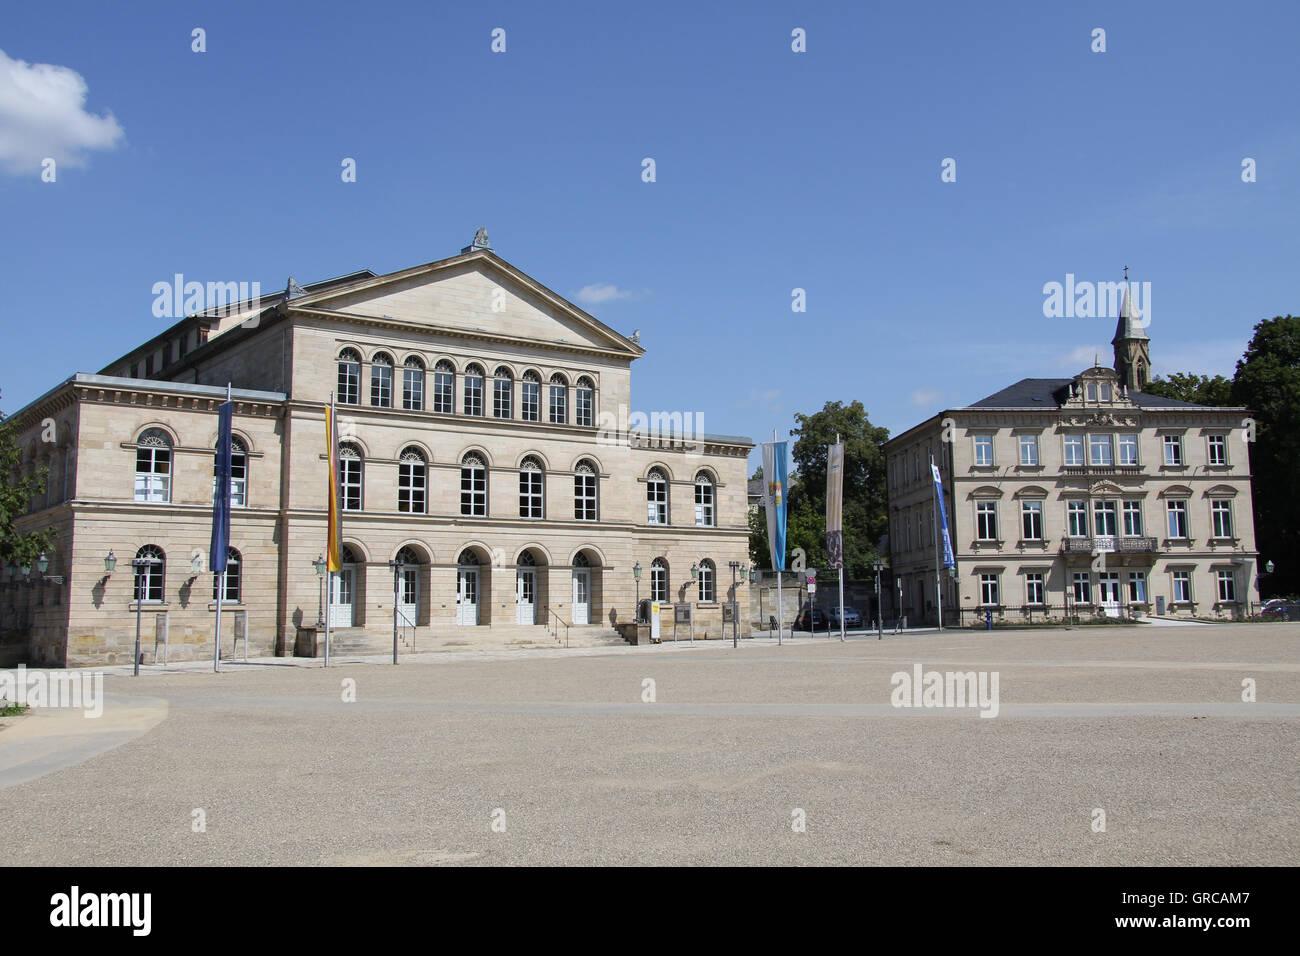 Schlossplatz Coburg With The Landestheater And Palais Edinburg, Upper Franconia, Bavaria, Germany, Europe - Stock Image